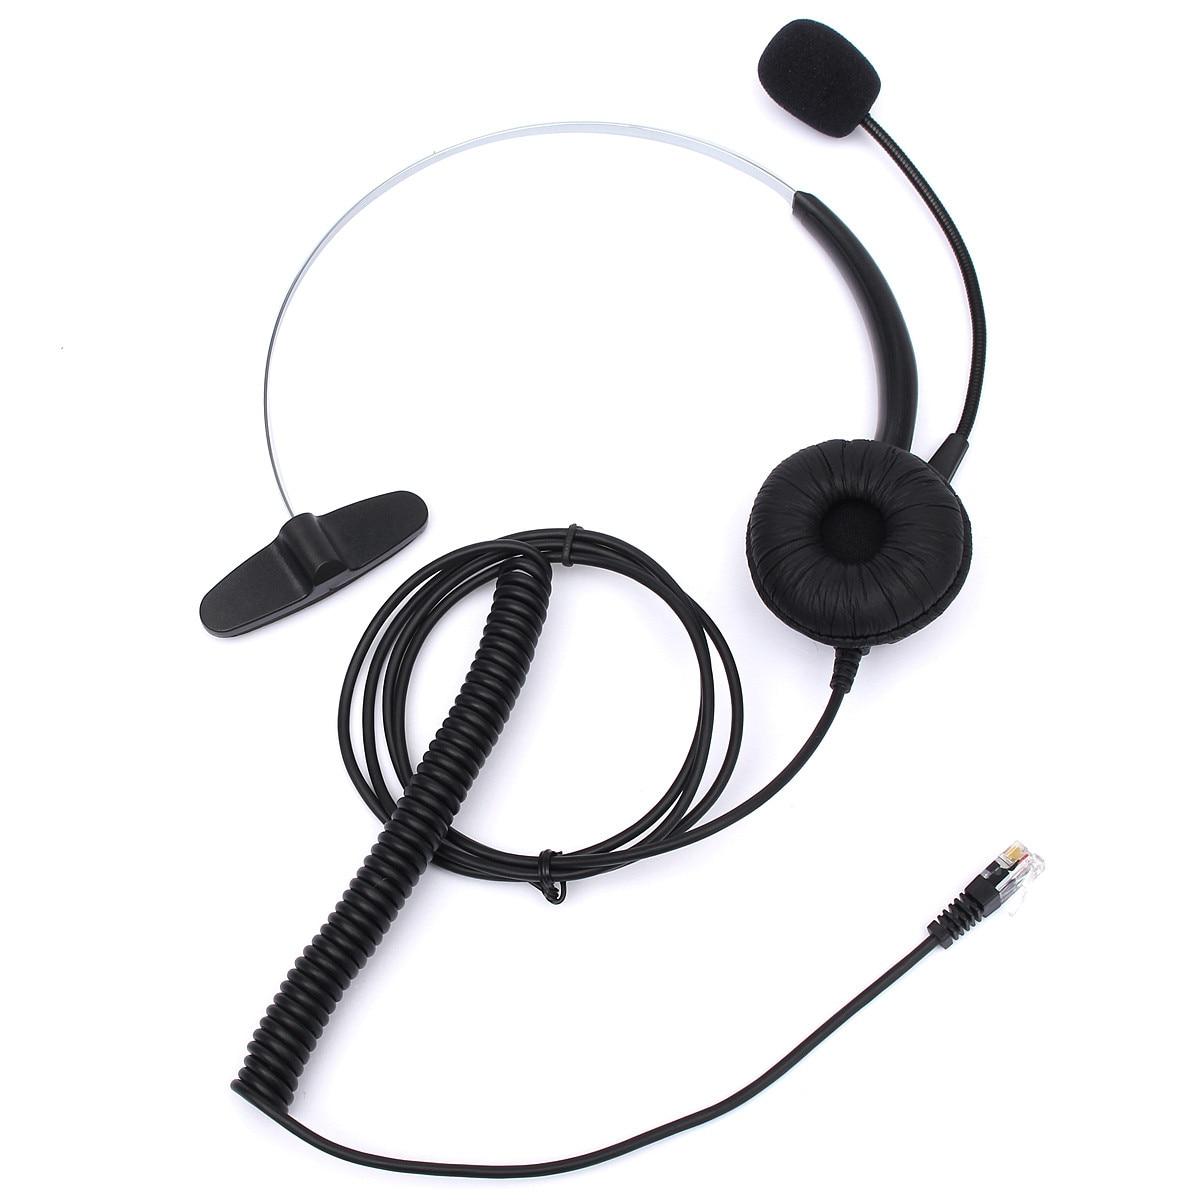 Nuevo RJ11 auriculares con micrófono ajustable diadema de Metal Teléfono de reducción de ruido auriculares para Oficina Centro